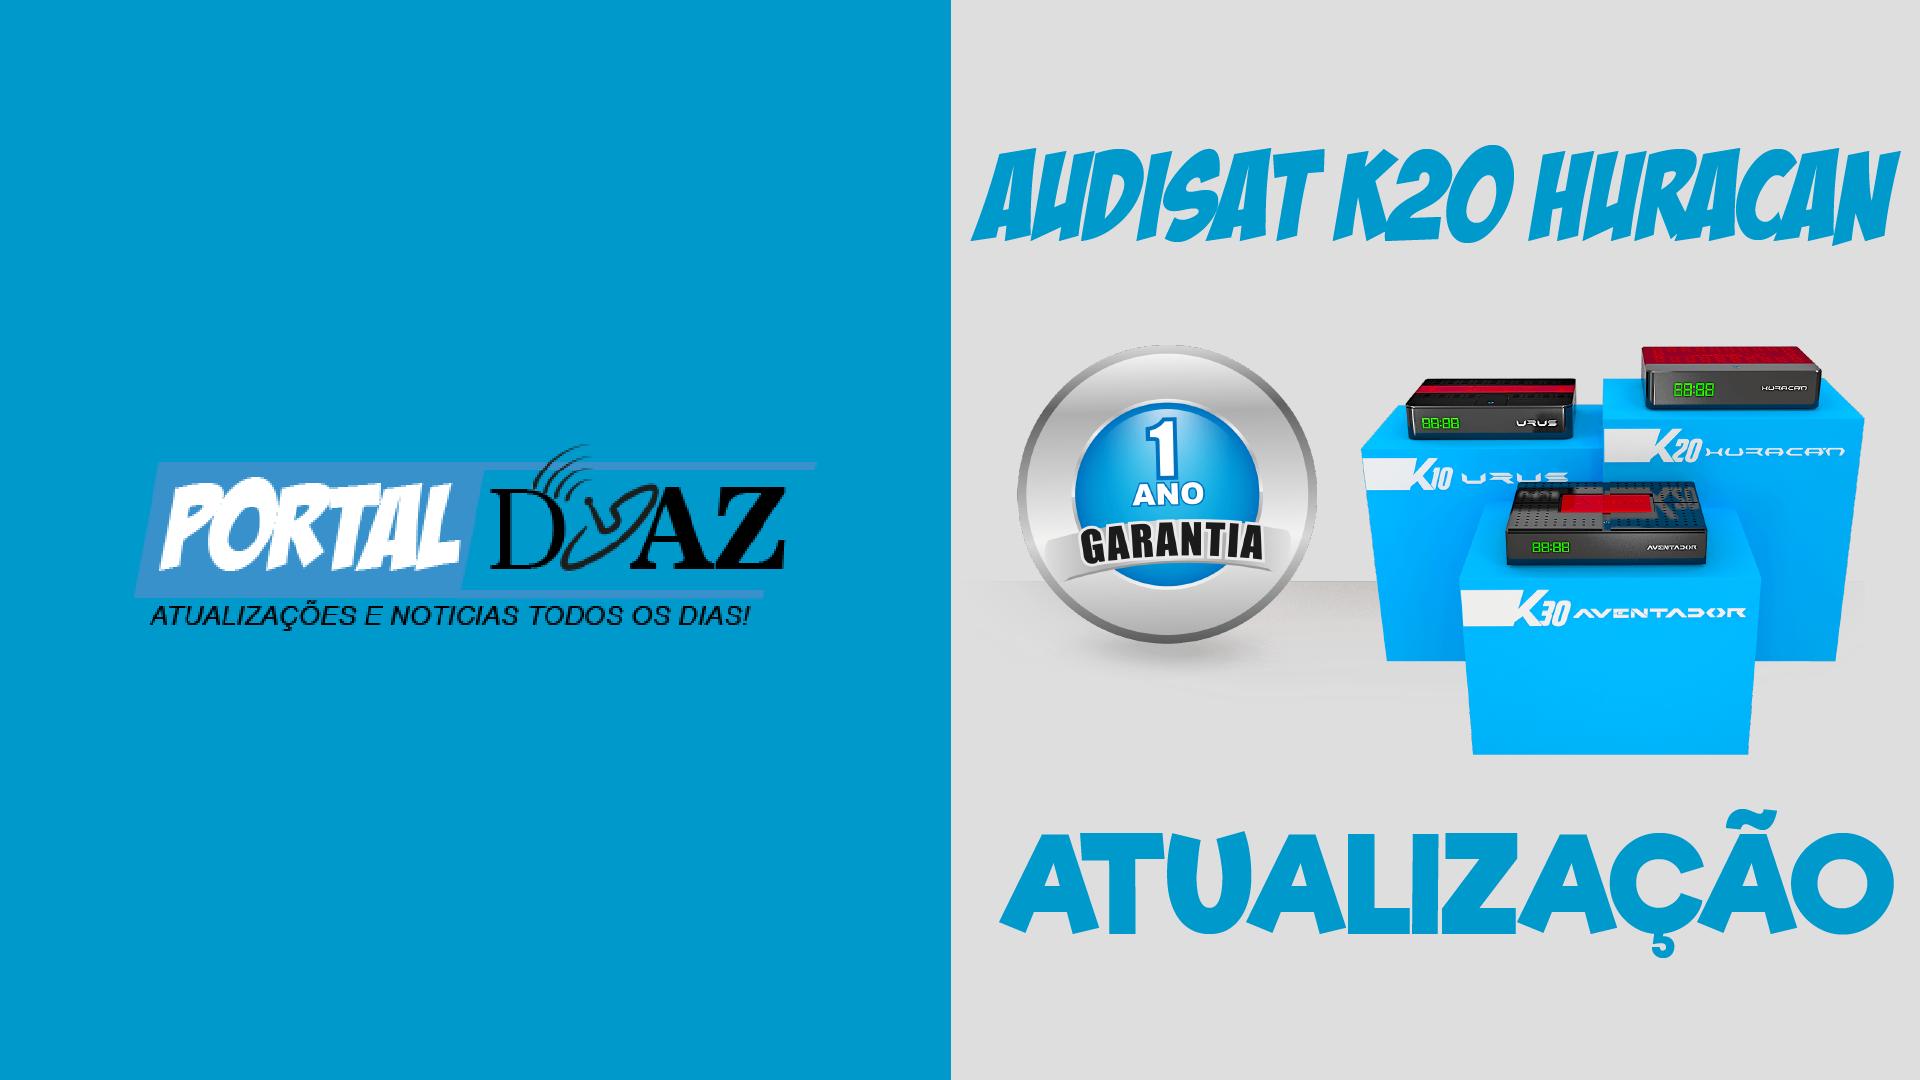 Audisat K20 Huracan